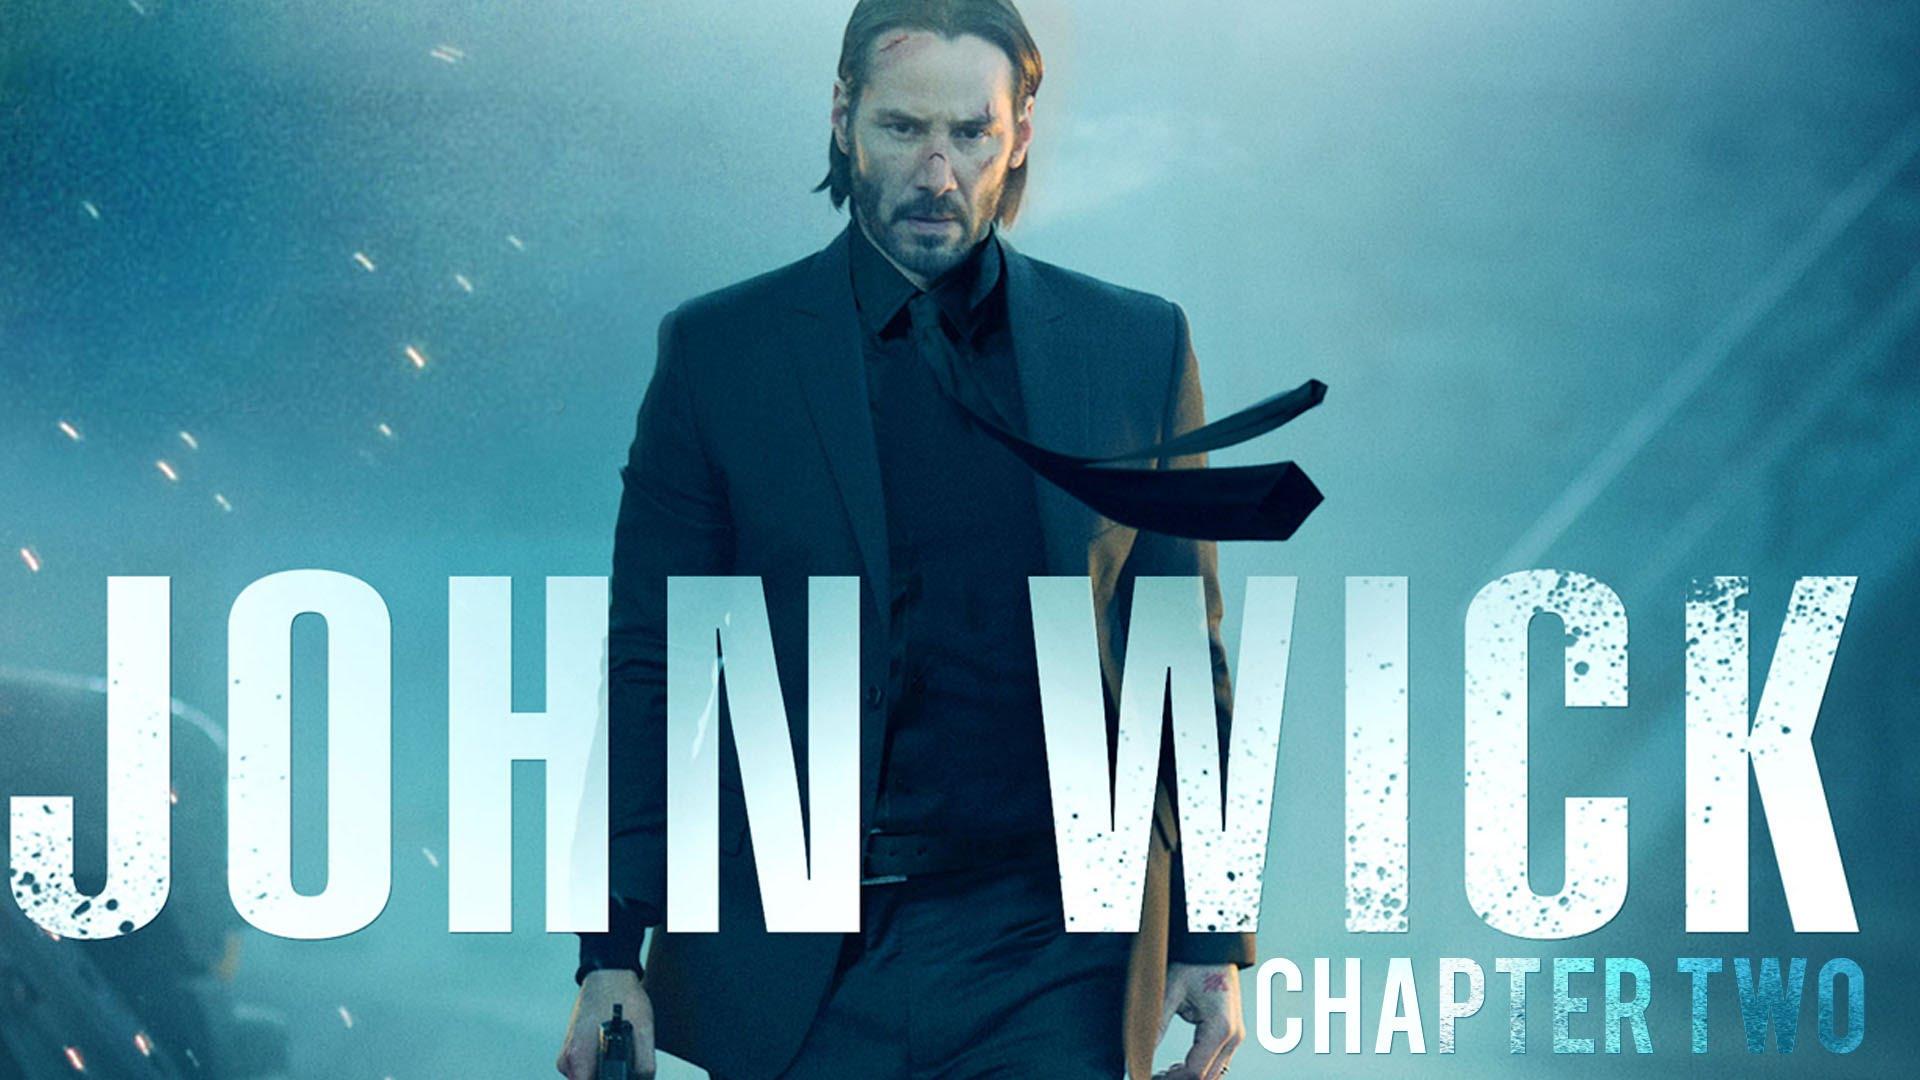 "Film John Wick ""Width ="" 1920 ""Height ="" 1080 ""srcset ="" https://www.samma3a.com/tech/en/wp-content/uploads/sites/2/2018/06/John-Wick- Chapitre -2.jpg 1920w, https://www.samma3a.com/tech/en/wp-content/uploads/sites/2/2018/06/John-Wick-Chapter-2-300x169.jpg 300w, https: / /www.samma3a.com/tech/en/wp-content/uploads/sites/2/2018/06/John-Wick-Chapter-2-768x432.jpg 768w, https://www.samma3a.com/tech / fr / wp-content / uploads / site / 2/2018/06 / John-Wick-Chapter-2-1024x576.jpg 1024w, https://www.samma3a.com/tech/en/wp-content/uploads/ sites / 2/2018/06 / John-Wick-Chapter-2-696x392.jpg 696w, https://www.samma3a.com/tech/en/wp-content/uploads/sites/2/2018/06/John - Wick-Chapter-2-1068x601.jpg 1068w, https://www.samma3a.com/tech/en/wp-content/uploads/sites/2/2018/06/John-Wick-Chapter-2-747x420. jpg 747w ""tailles ="" (largeur maximale: 1920px) 100vw, 1920px"